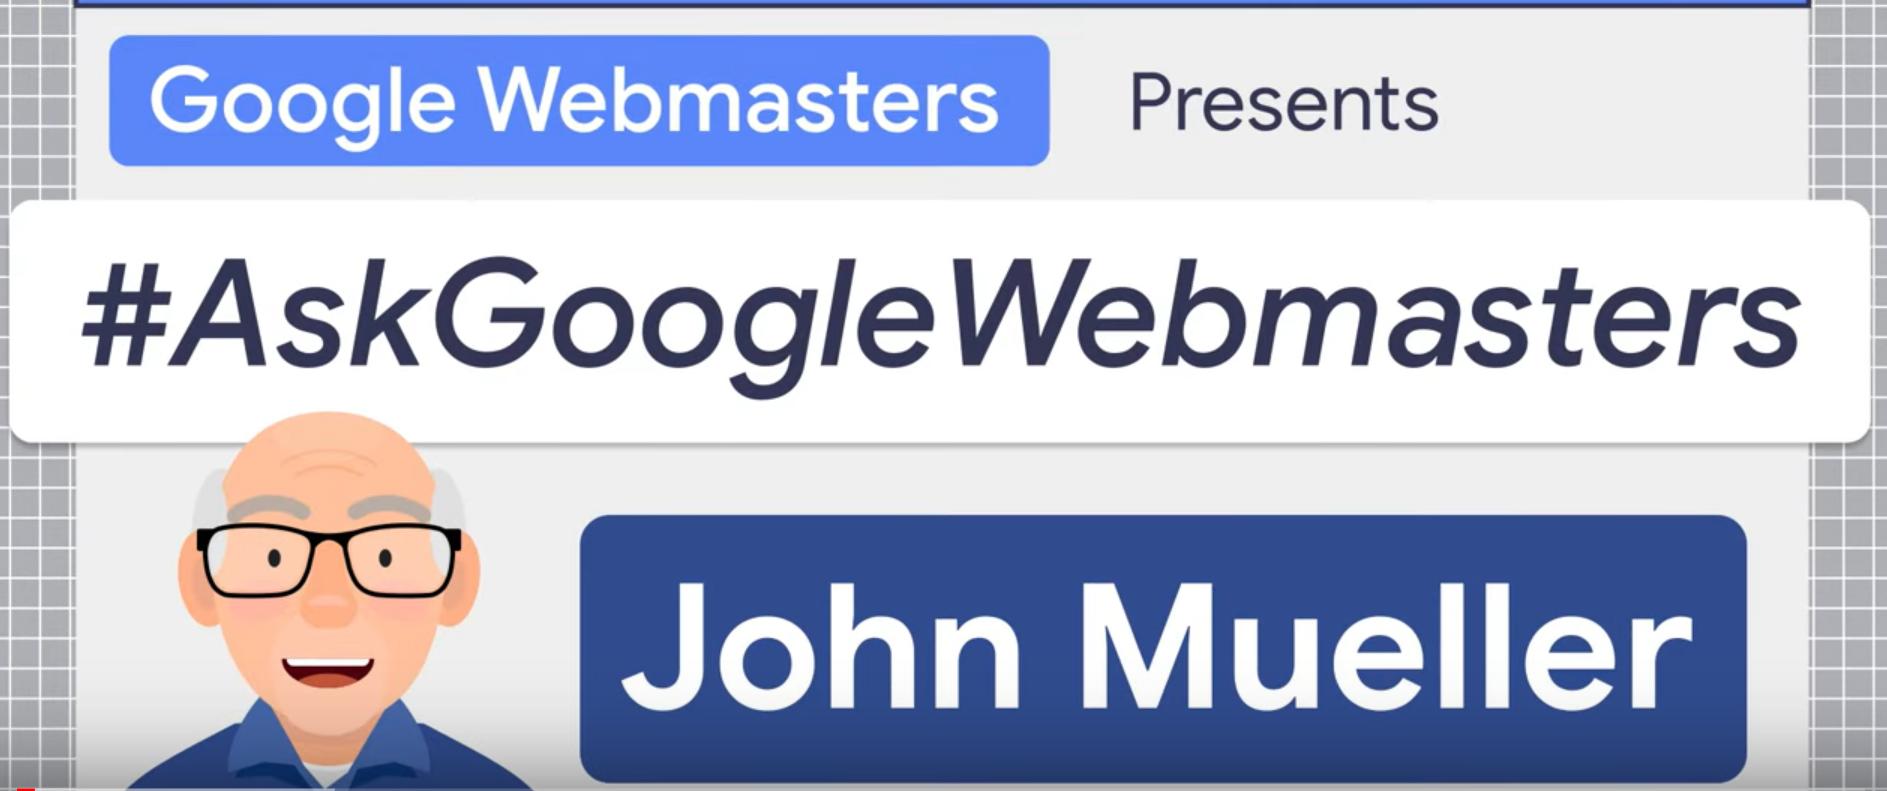 canoniques google john mueller